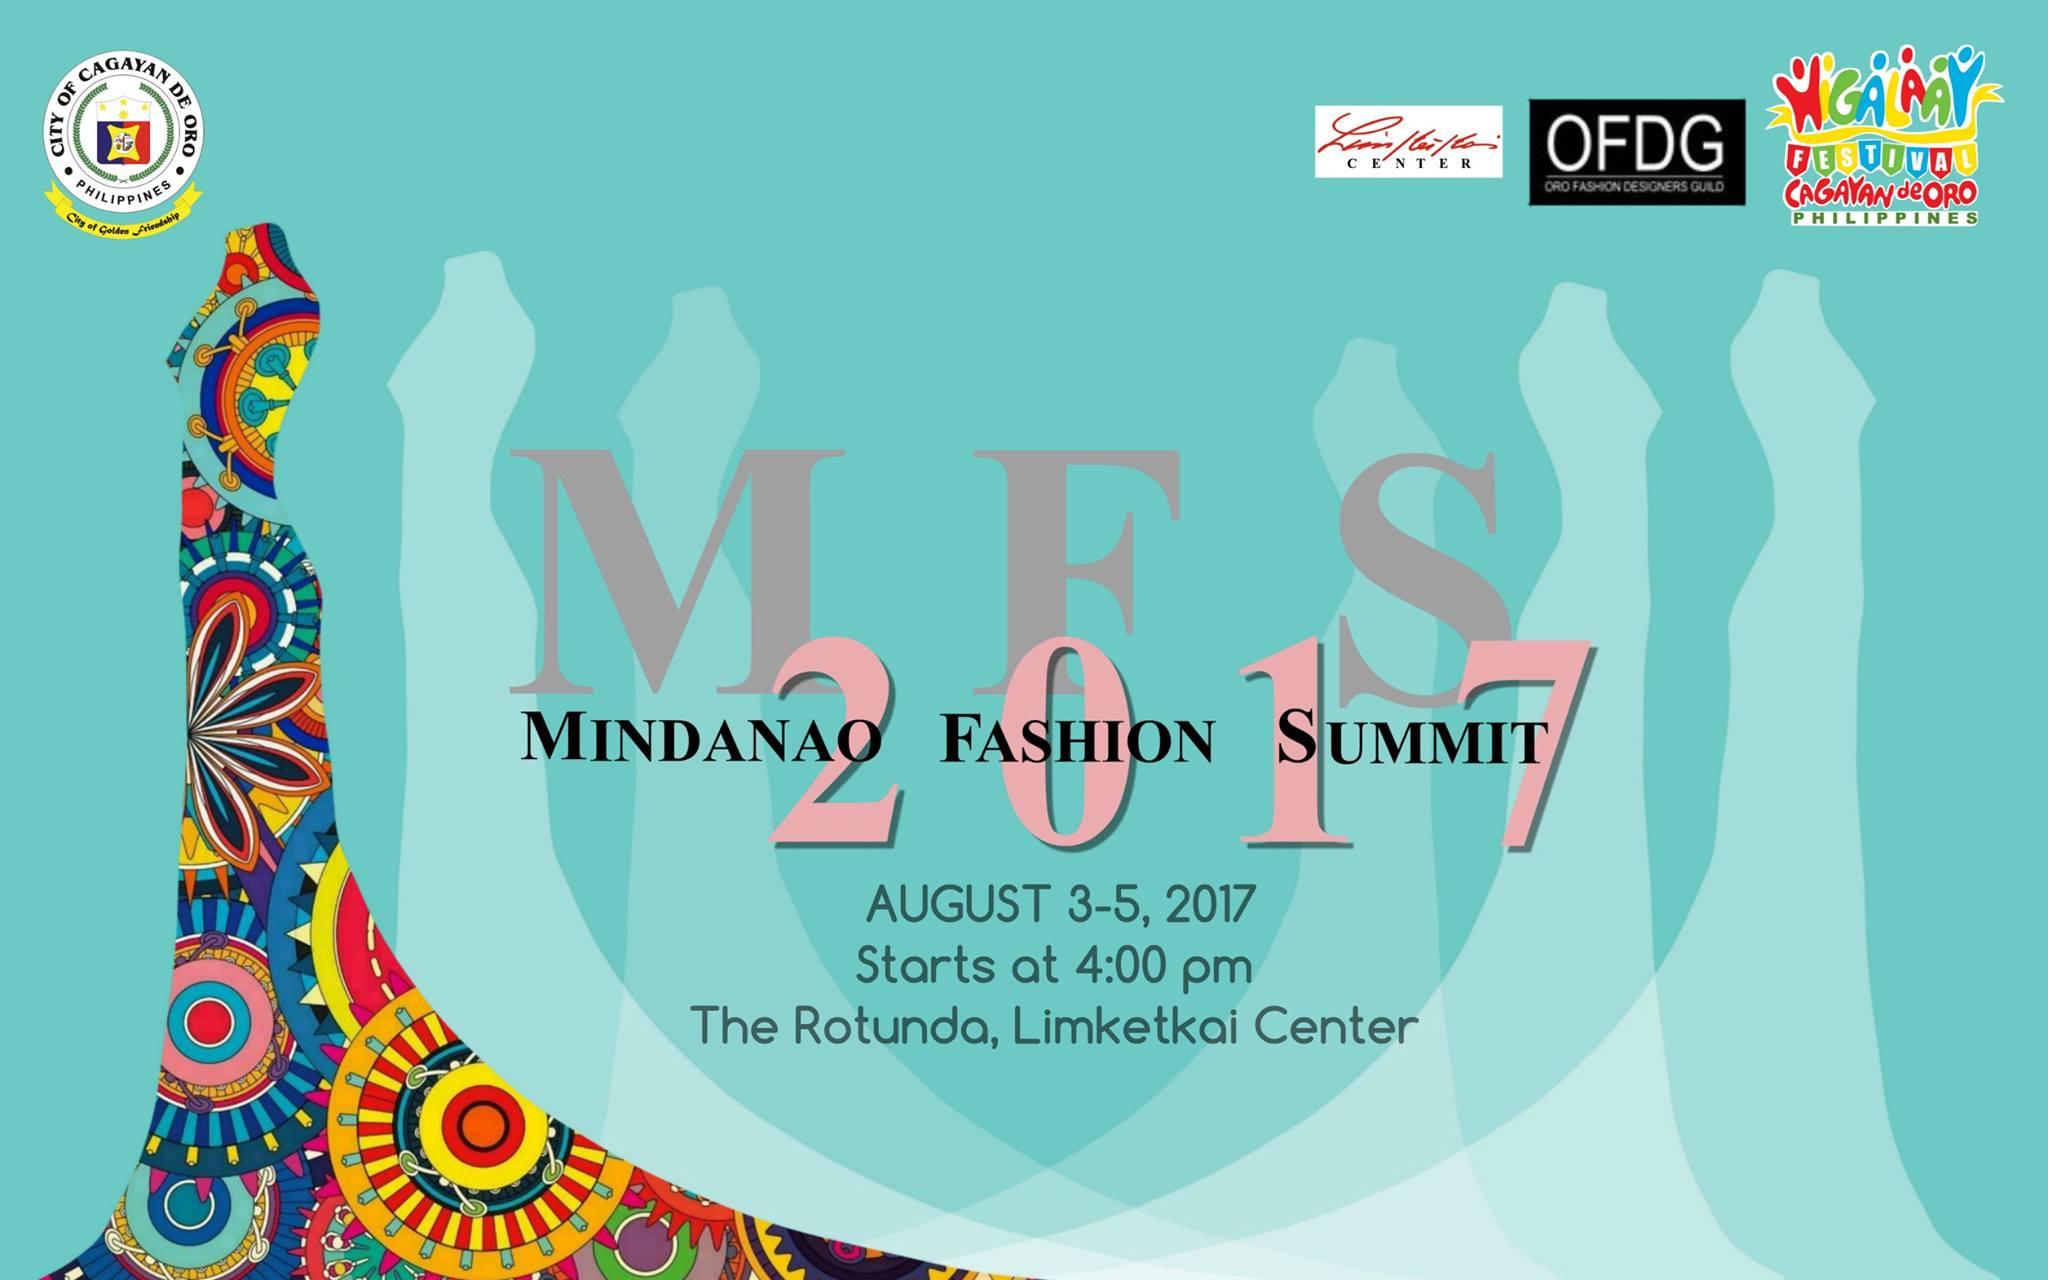 Mindanao Fashion Summit 2017, Mindanao Fashion Summit